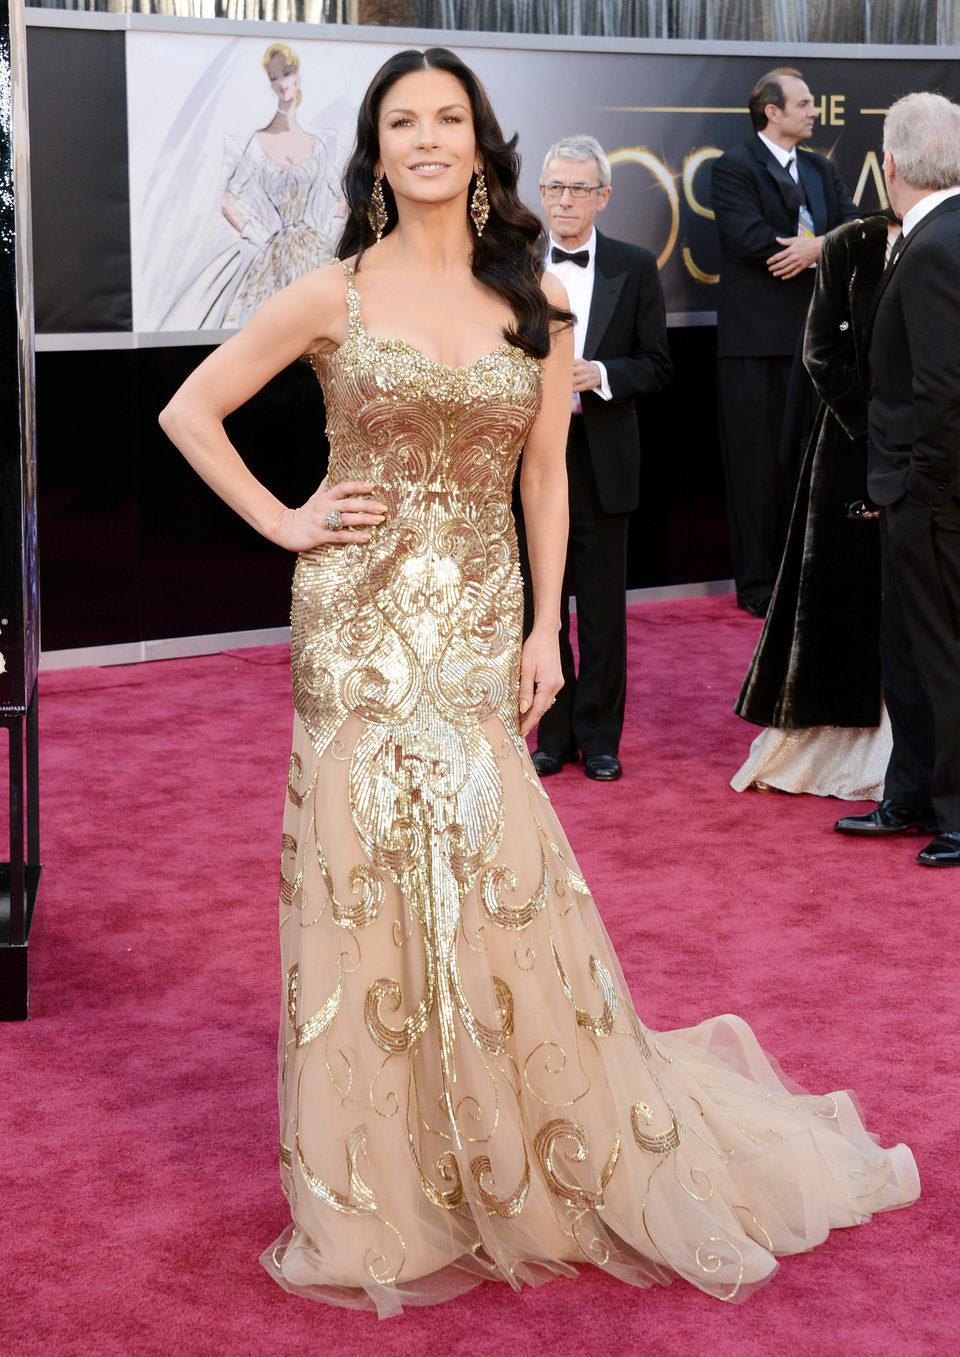 Catherine Zeta-Jones en los Oscar 2013